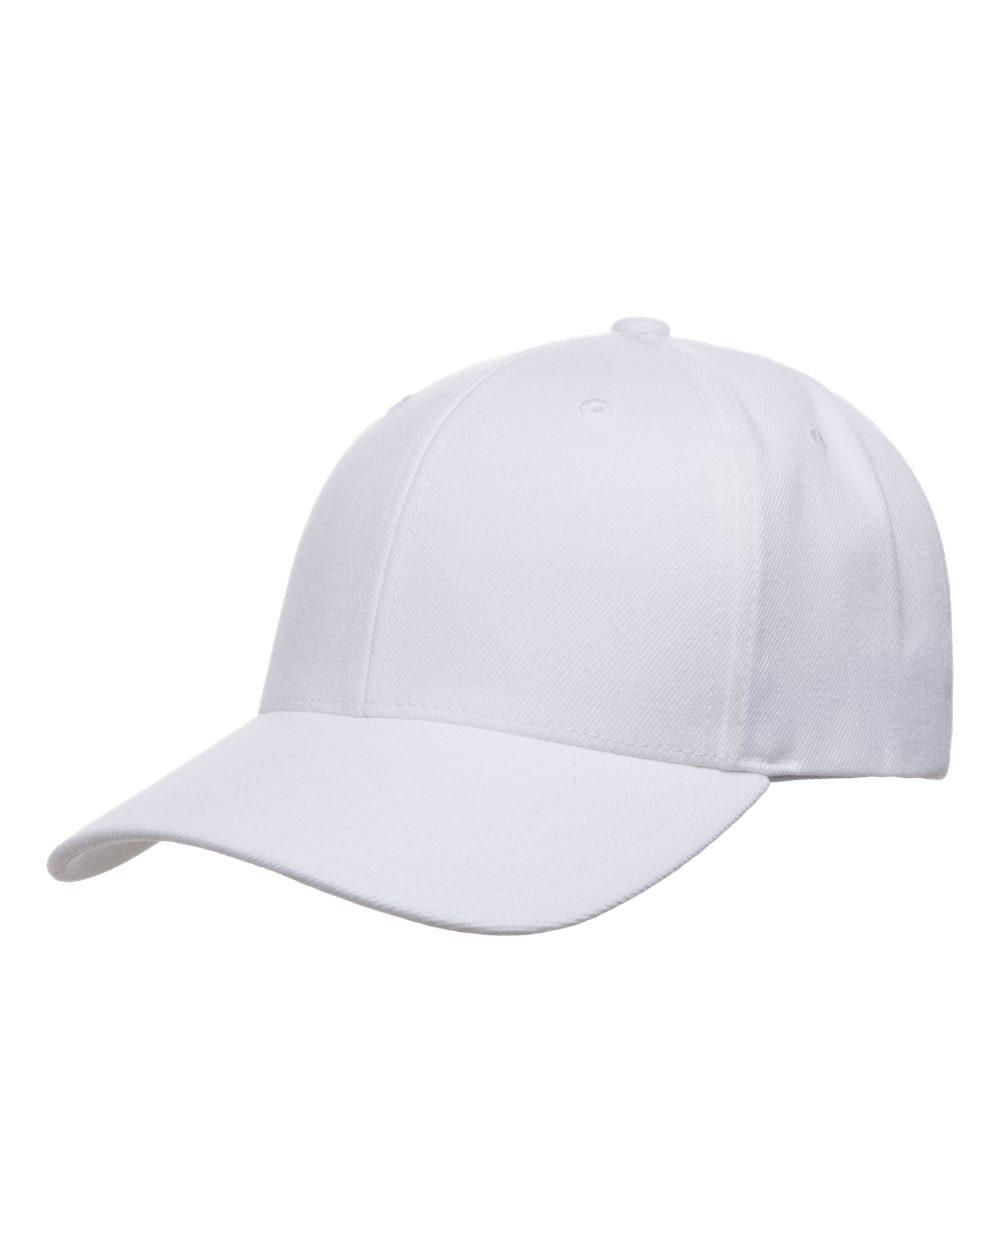 Yupoong 6789M - Premium Curved Visor Snapback Cap  5.50 - Headwear b4f7f4b5b84